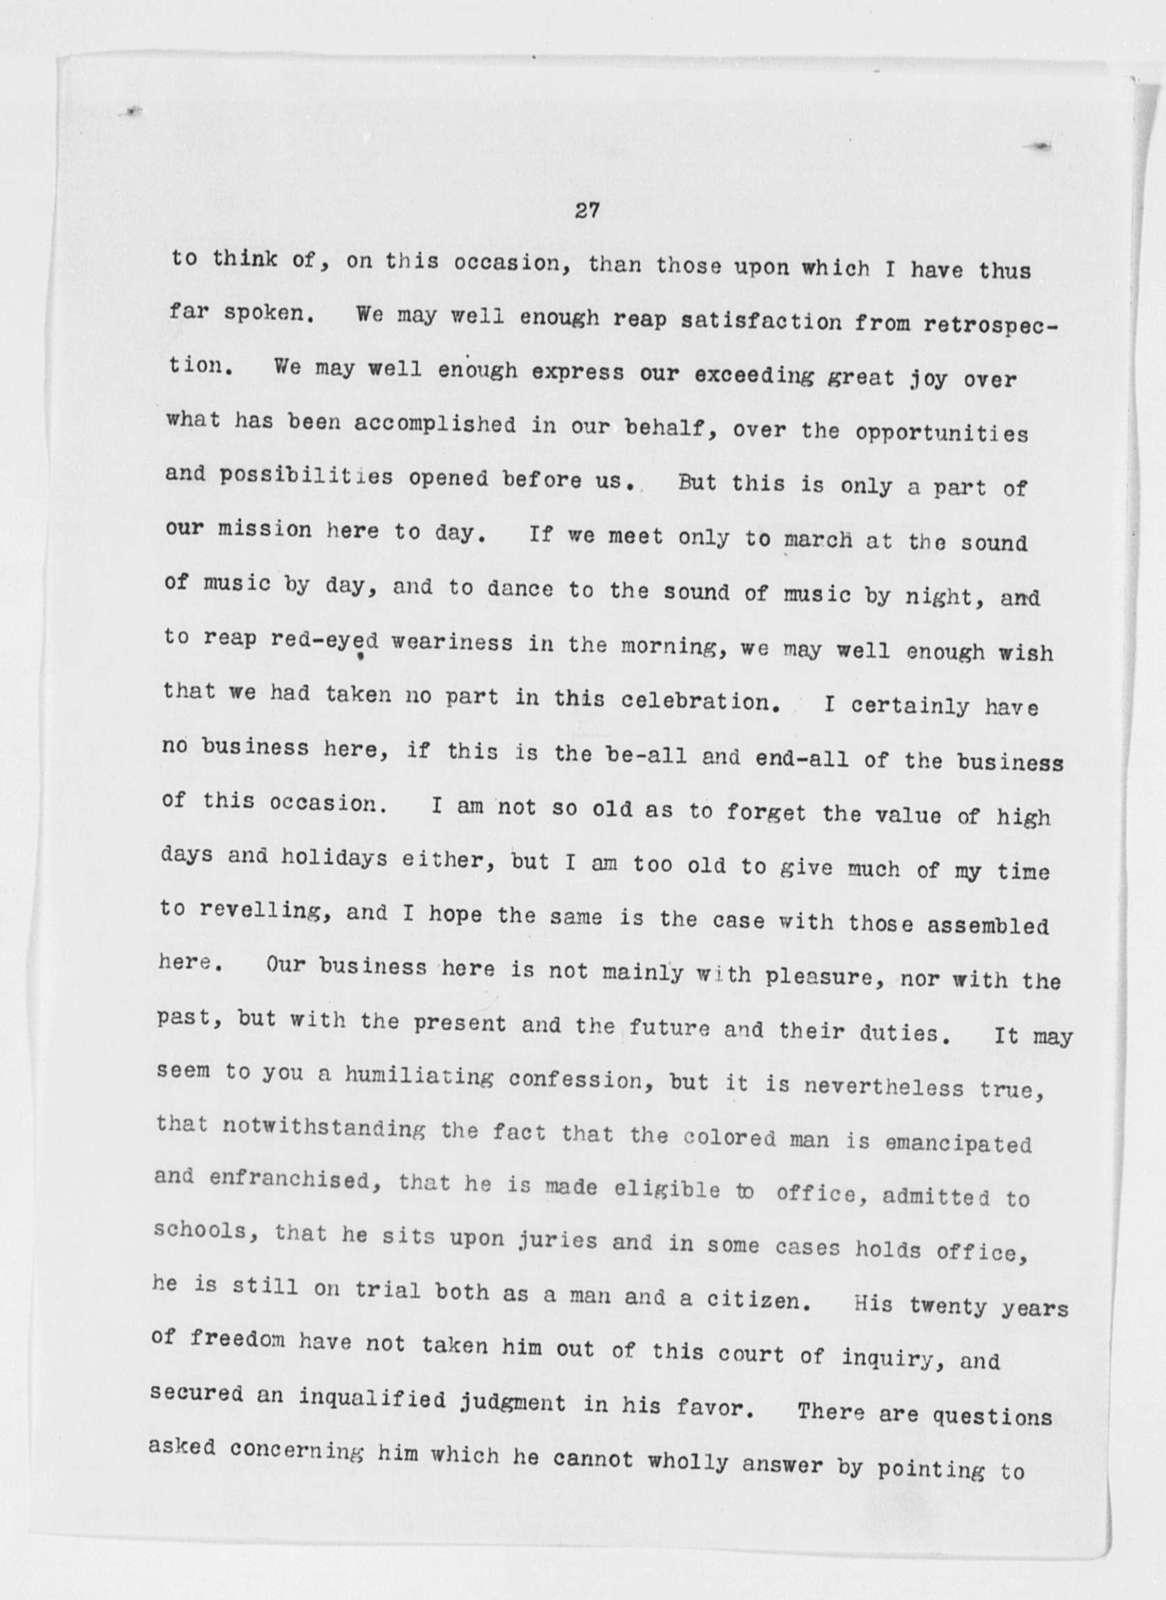 Speech on Emancipation Day, Rochester, N. Y.